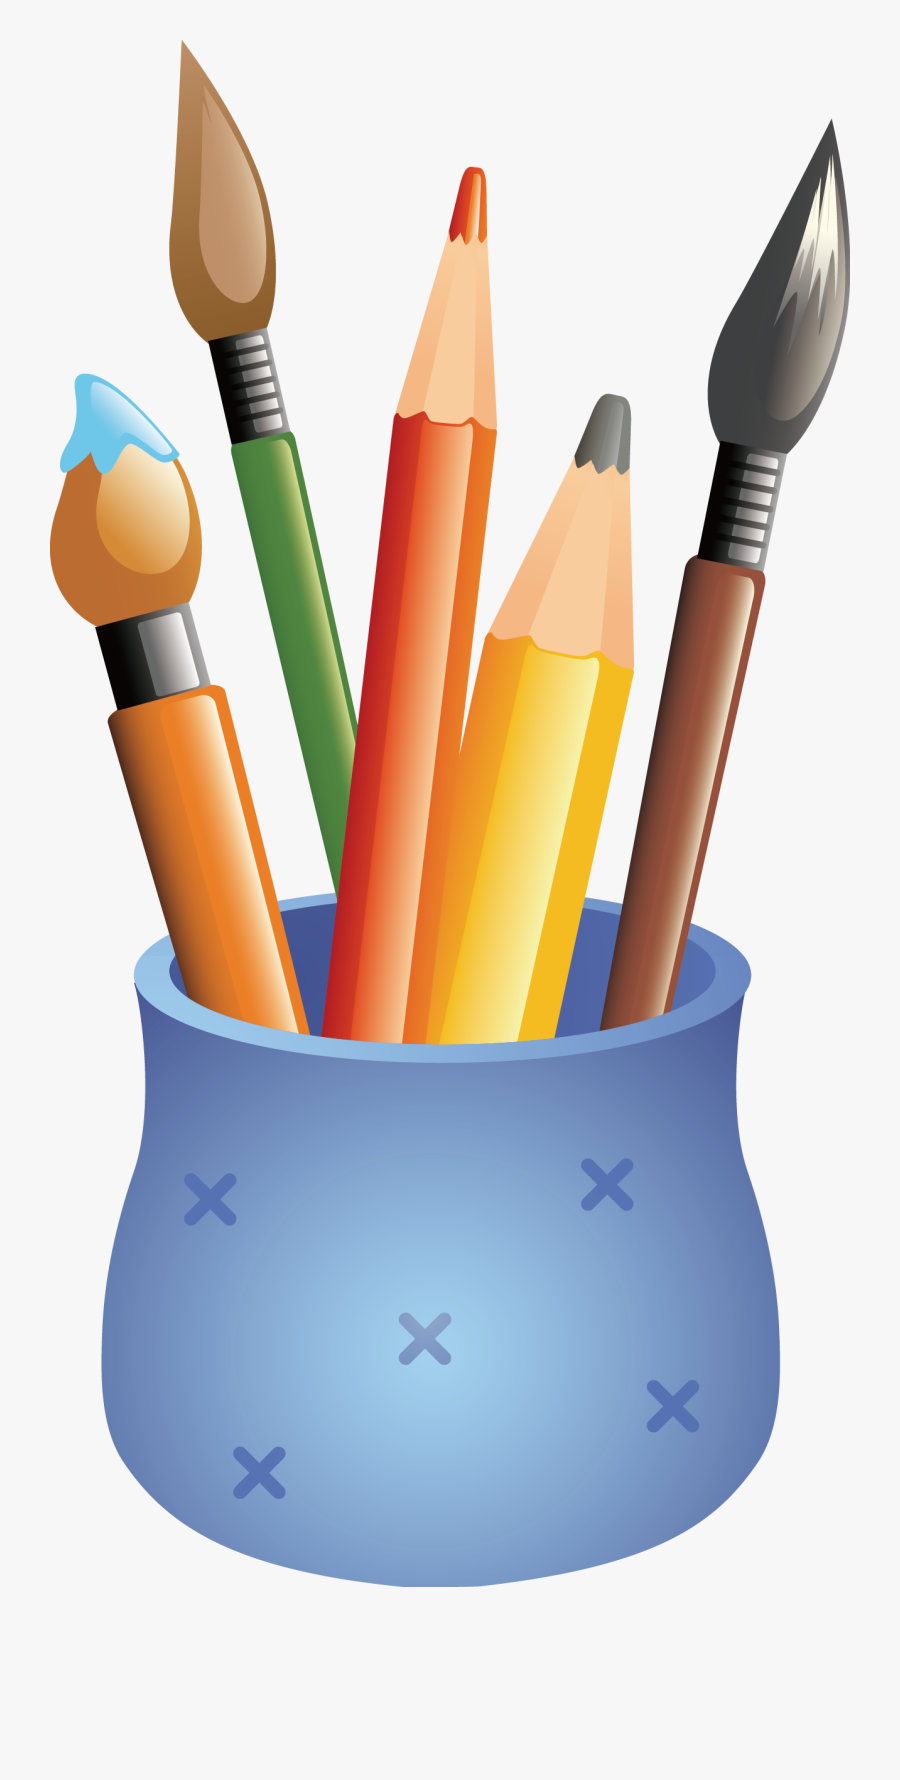 Svg Transparent Stock Bananas Drawing Colored Pencil - Colour Pencils Drawing Png, Transparent Clipart